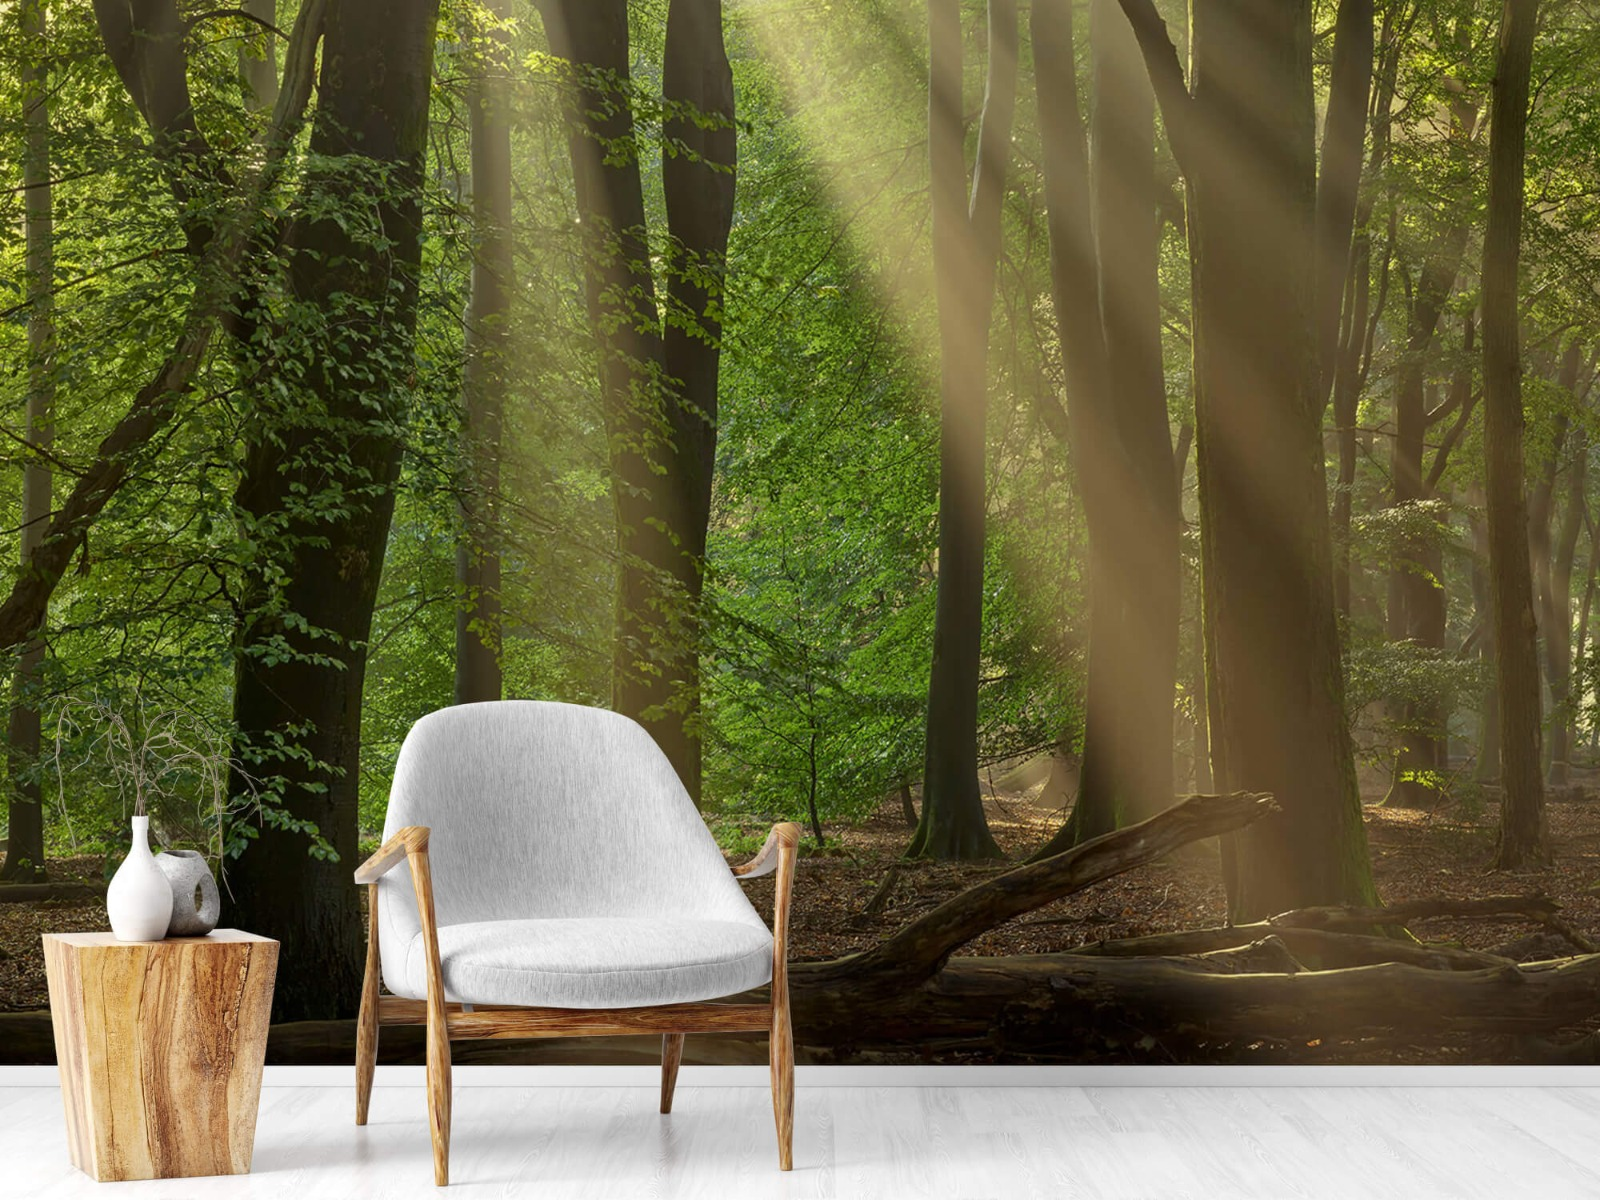 Bomen - Zonneharpen in het bos - Slaapkamer 19